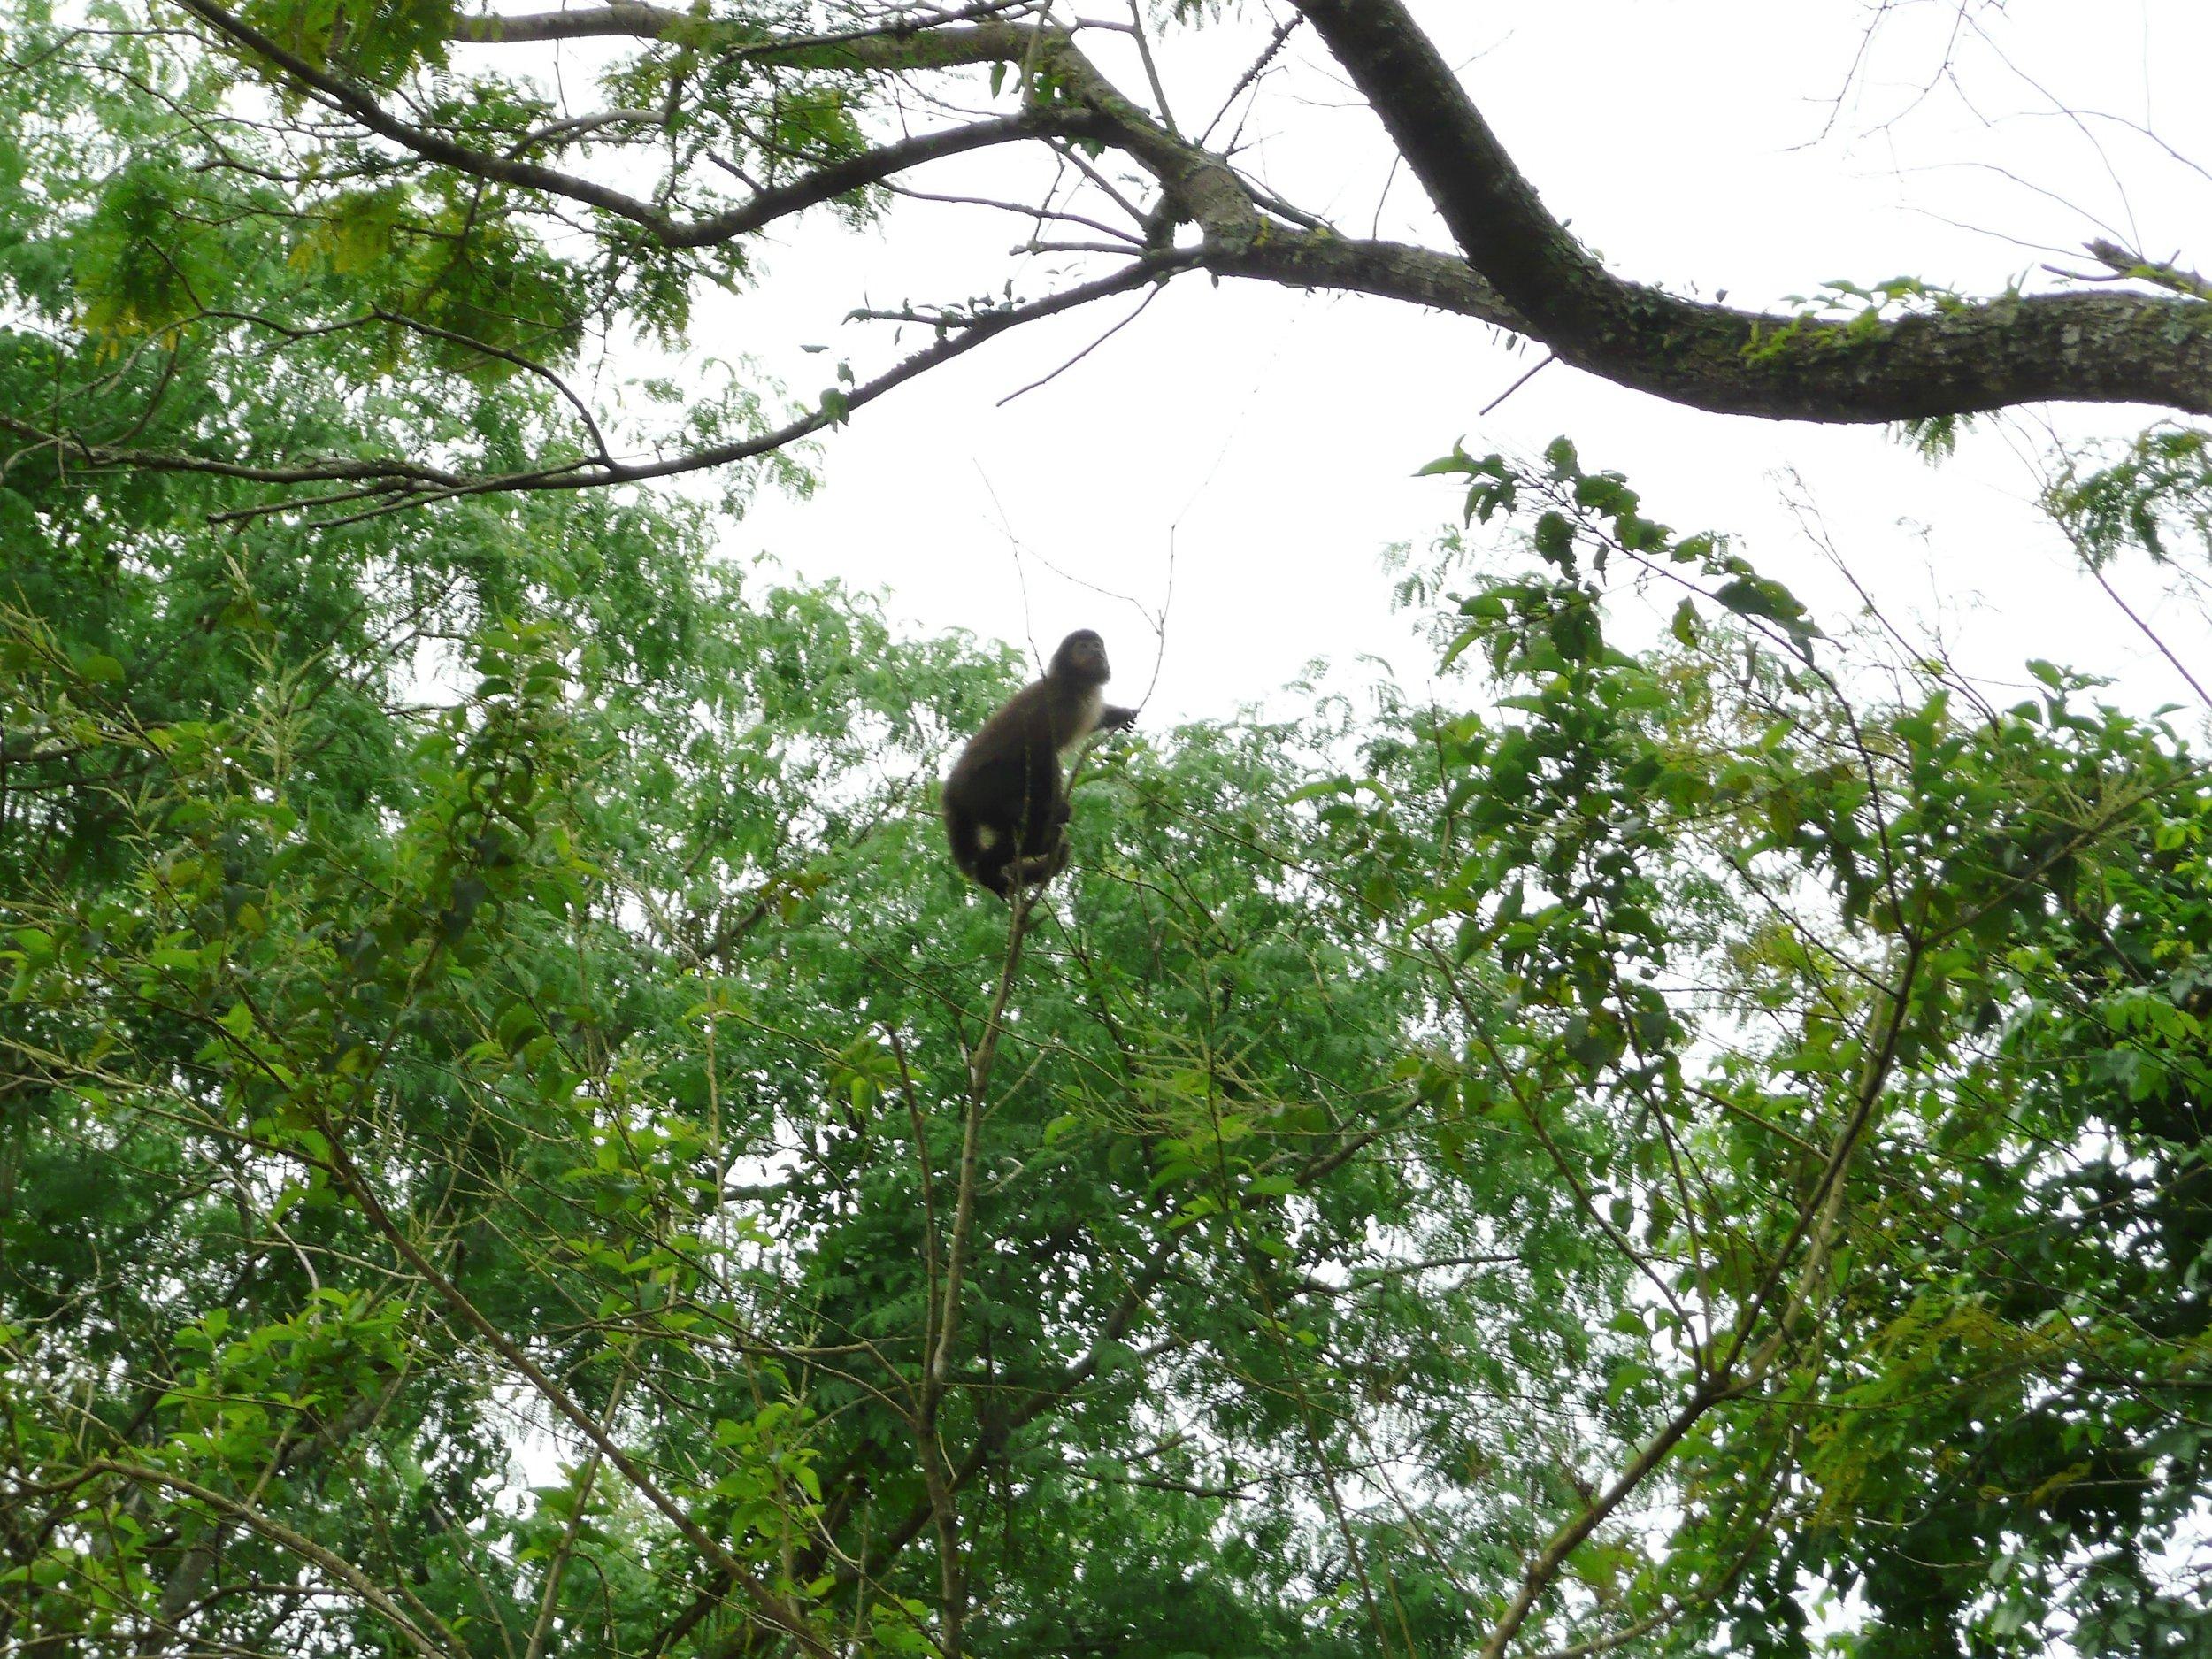 Capuchin monkey in the wild (Brazil)